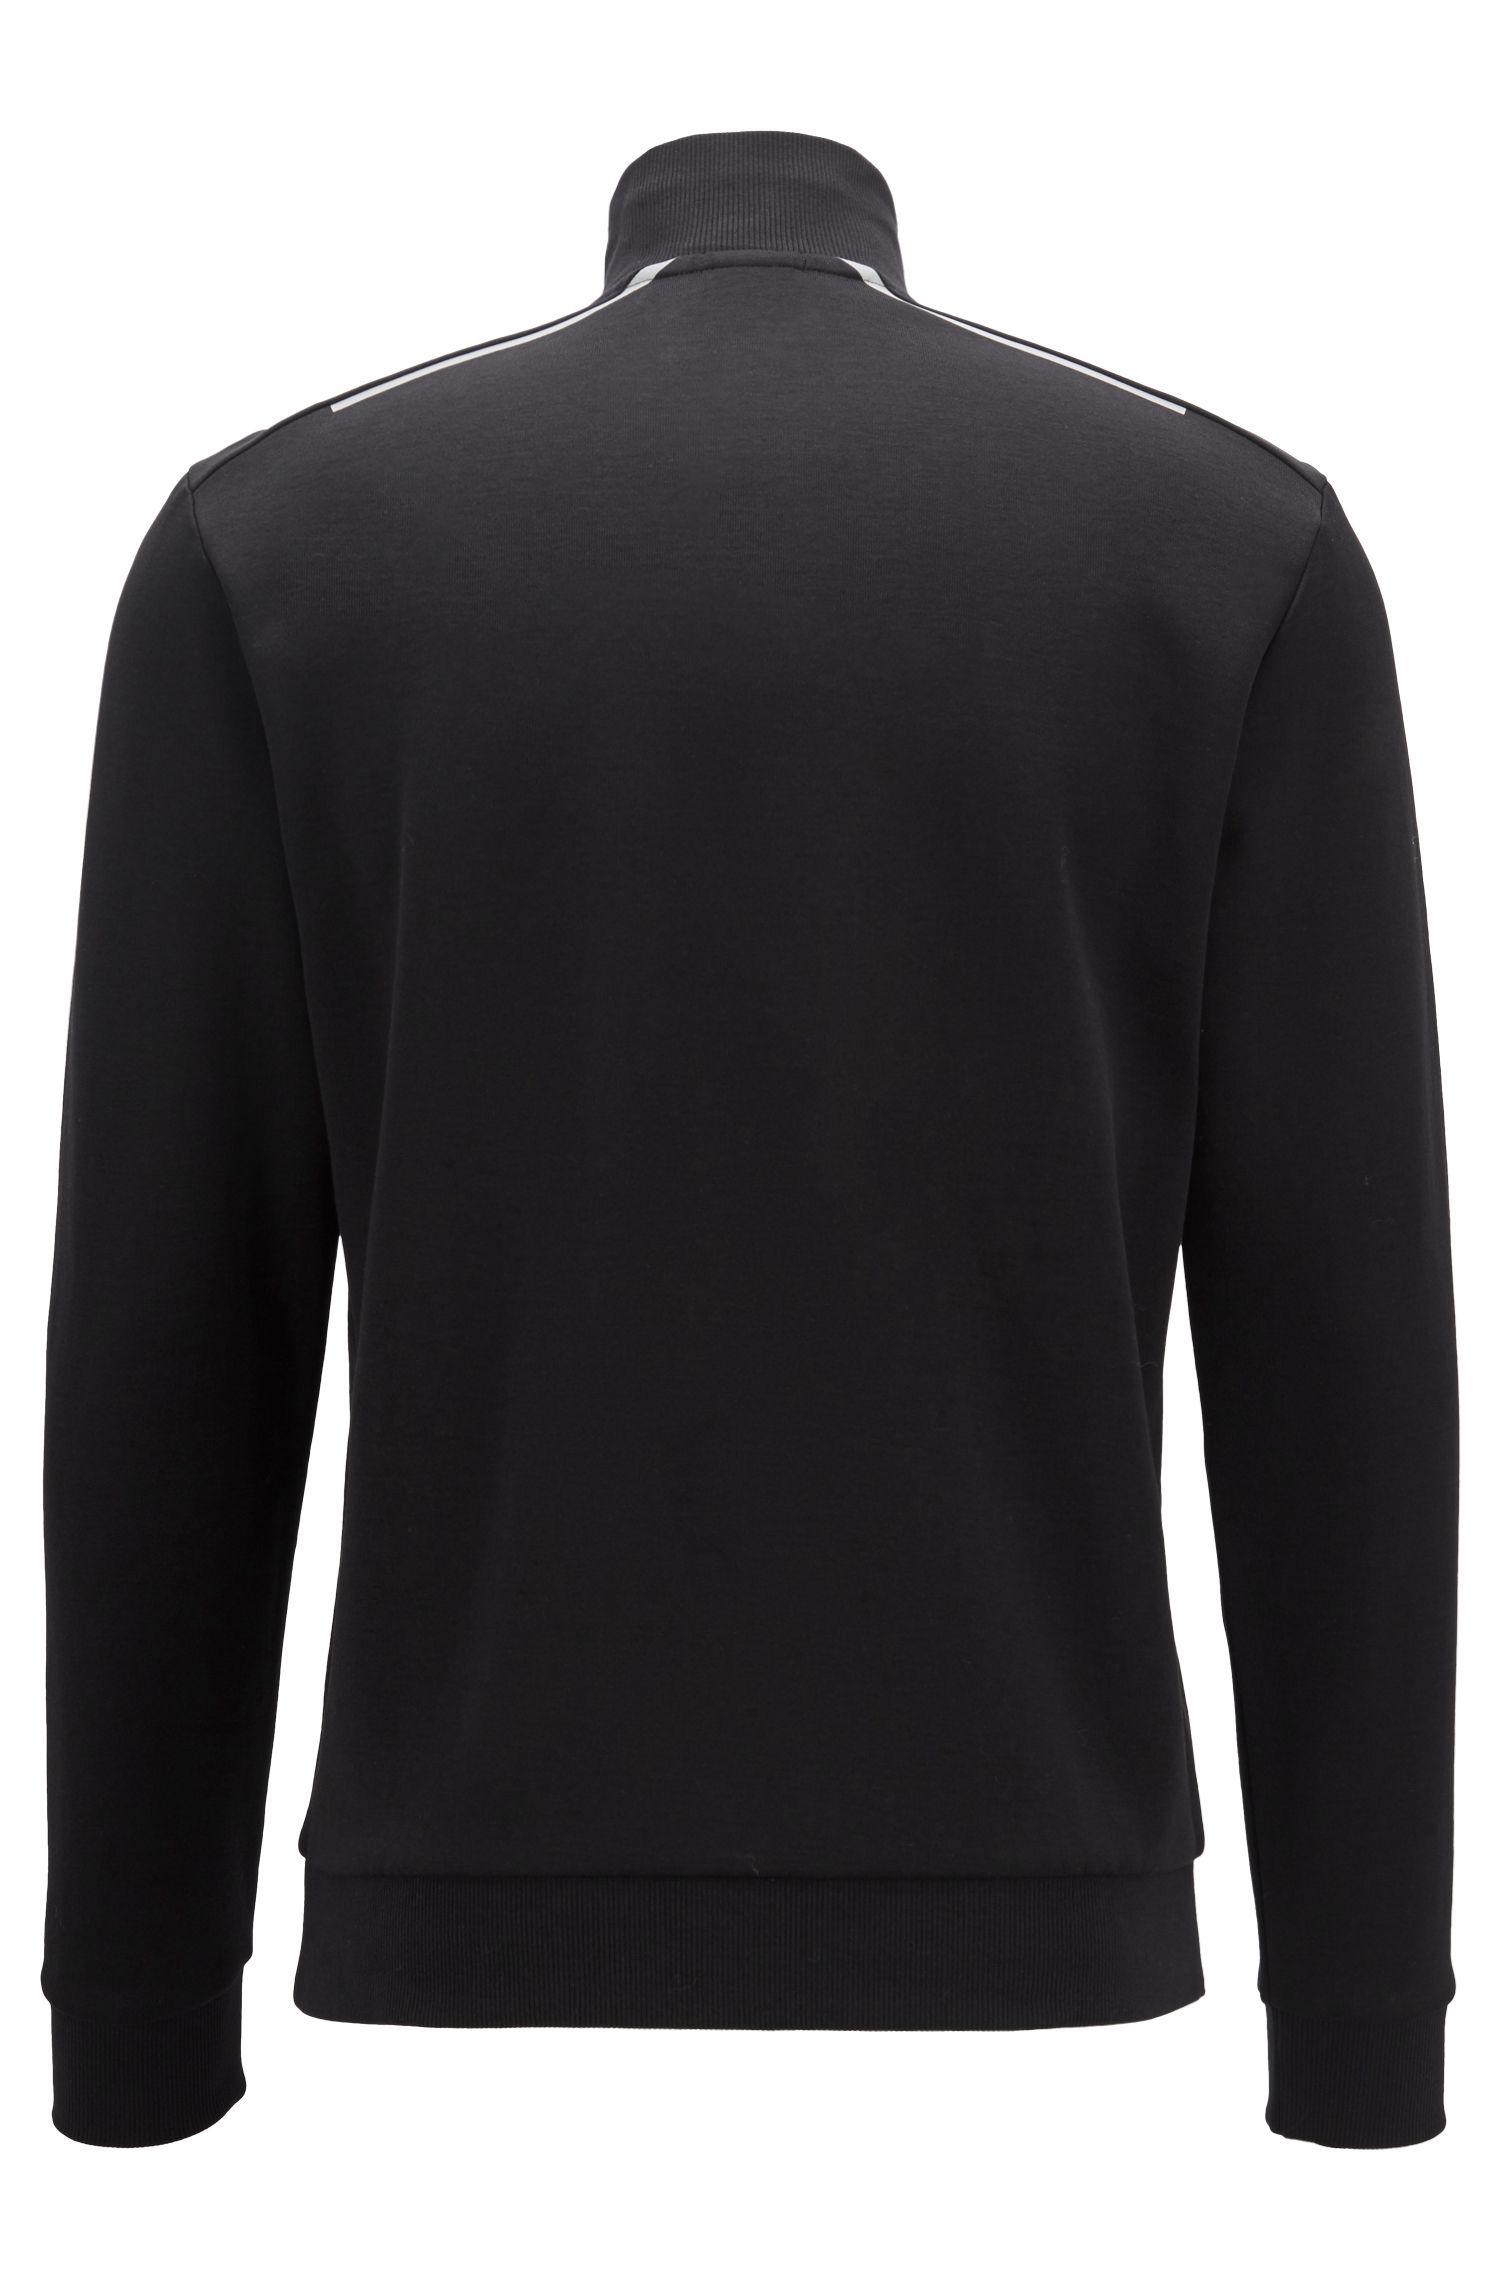 Sudadera con cremallera en mezcla de algodón con detalles reflectantes, Negro